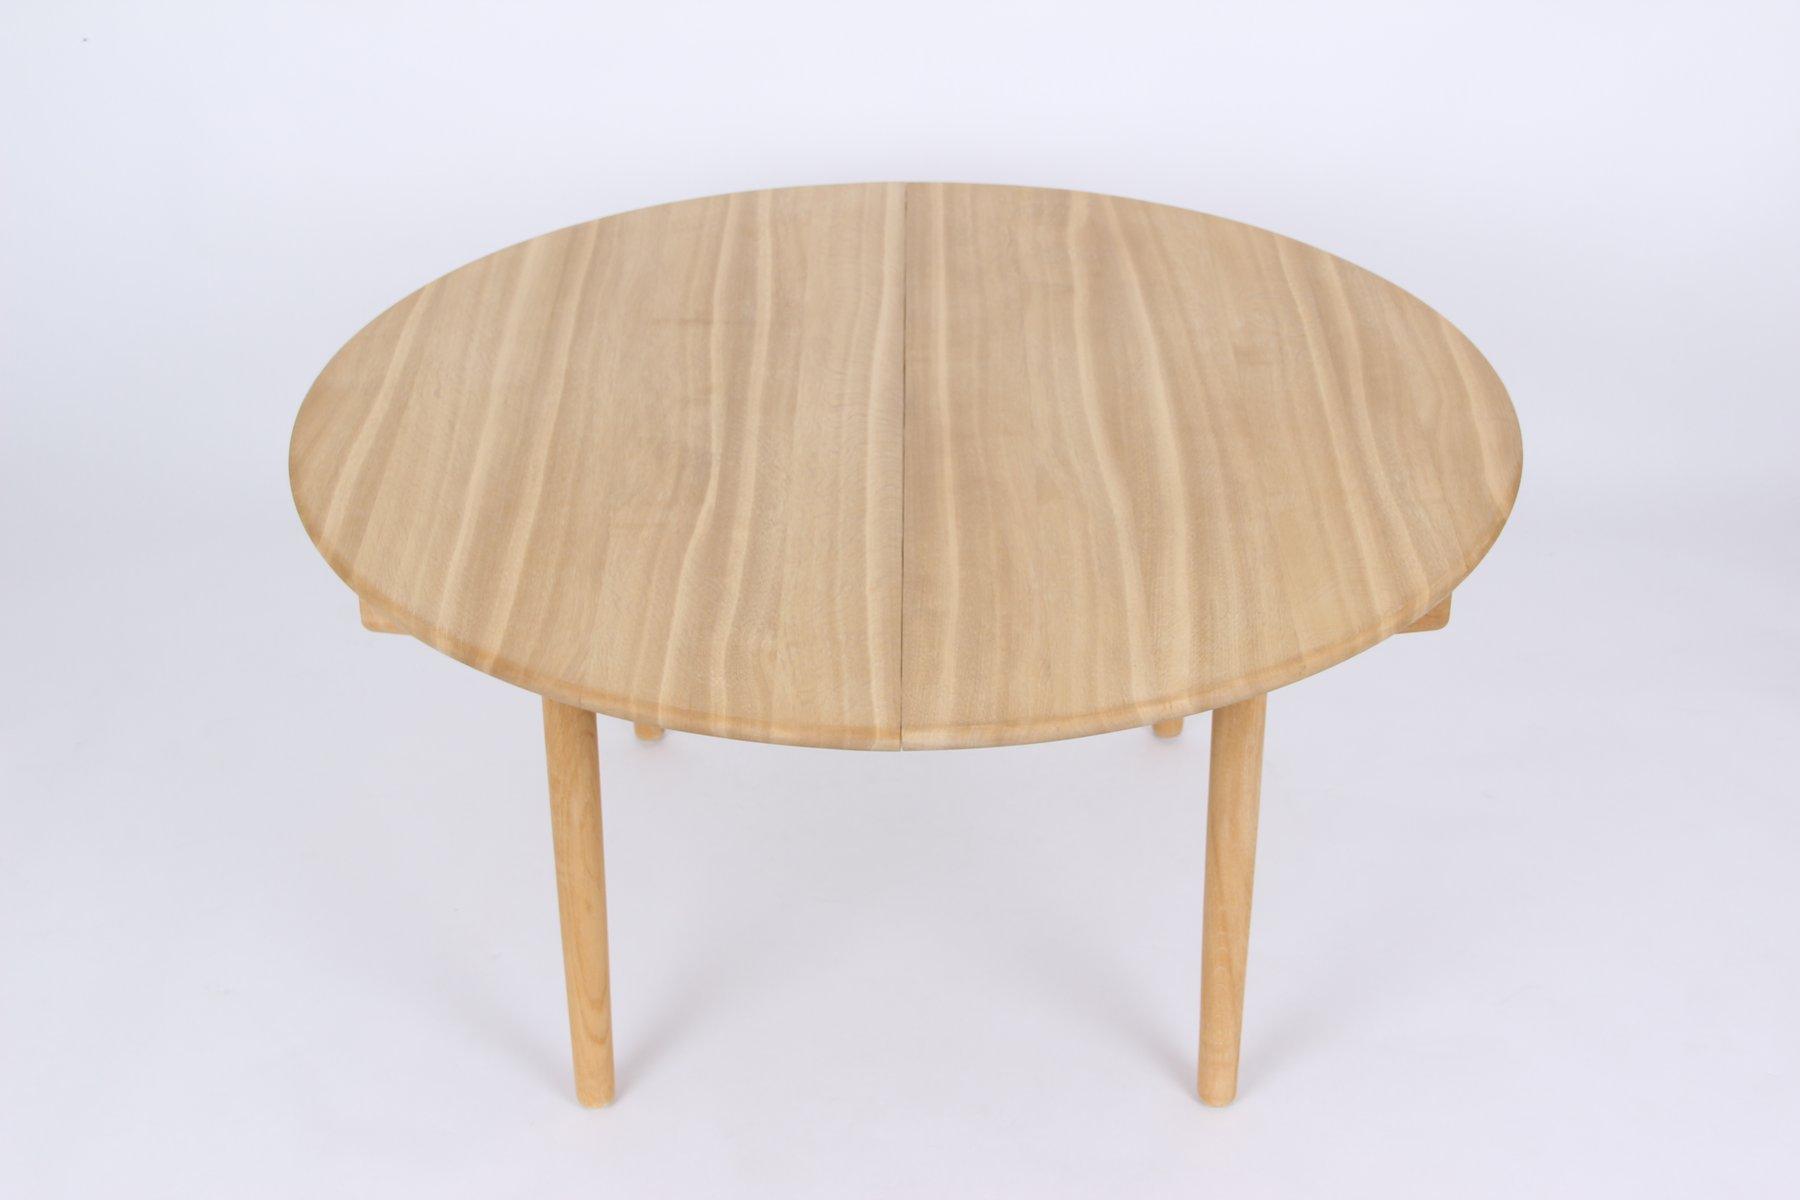 Vintage Danish Oak Pp70 Dining Table By Hans J Wegner For Pp Møbler